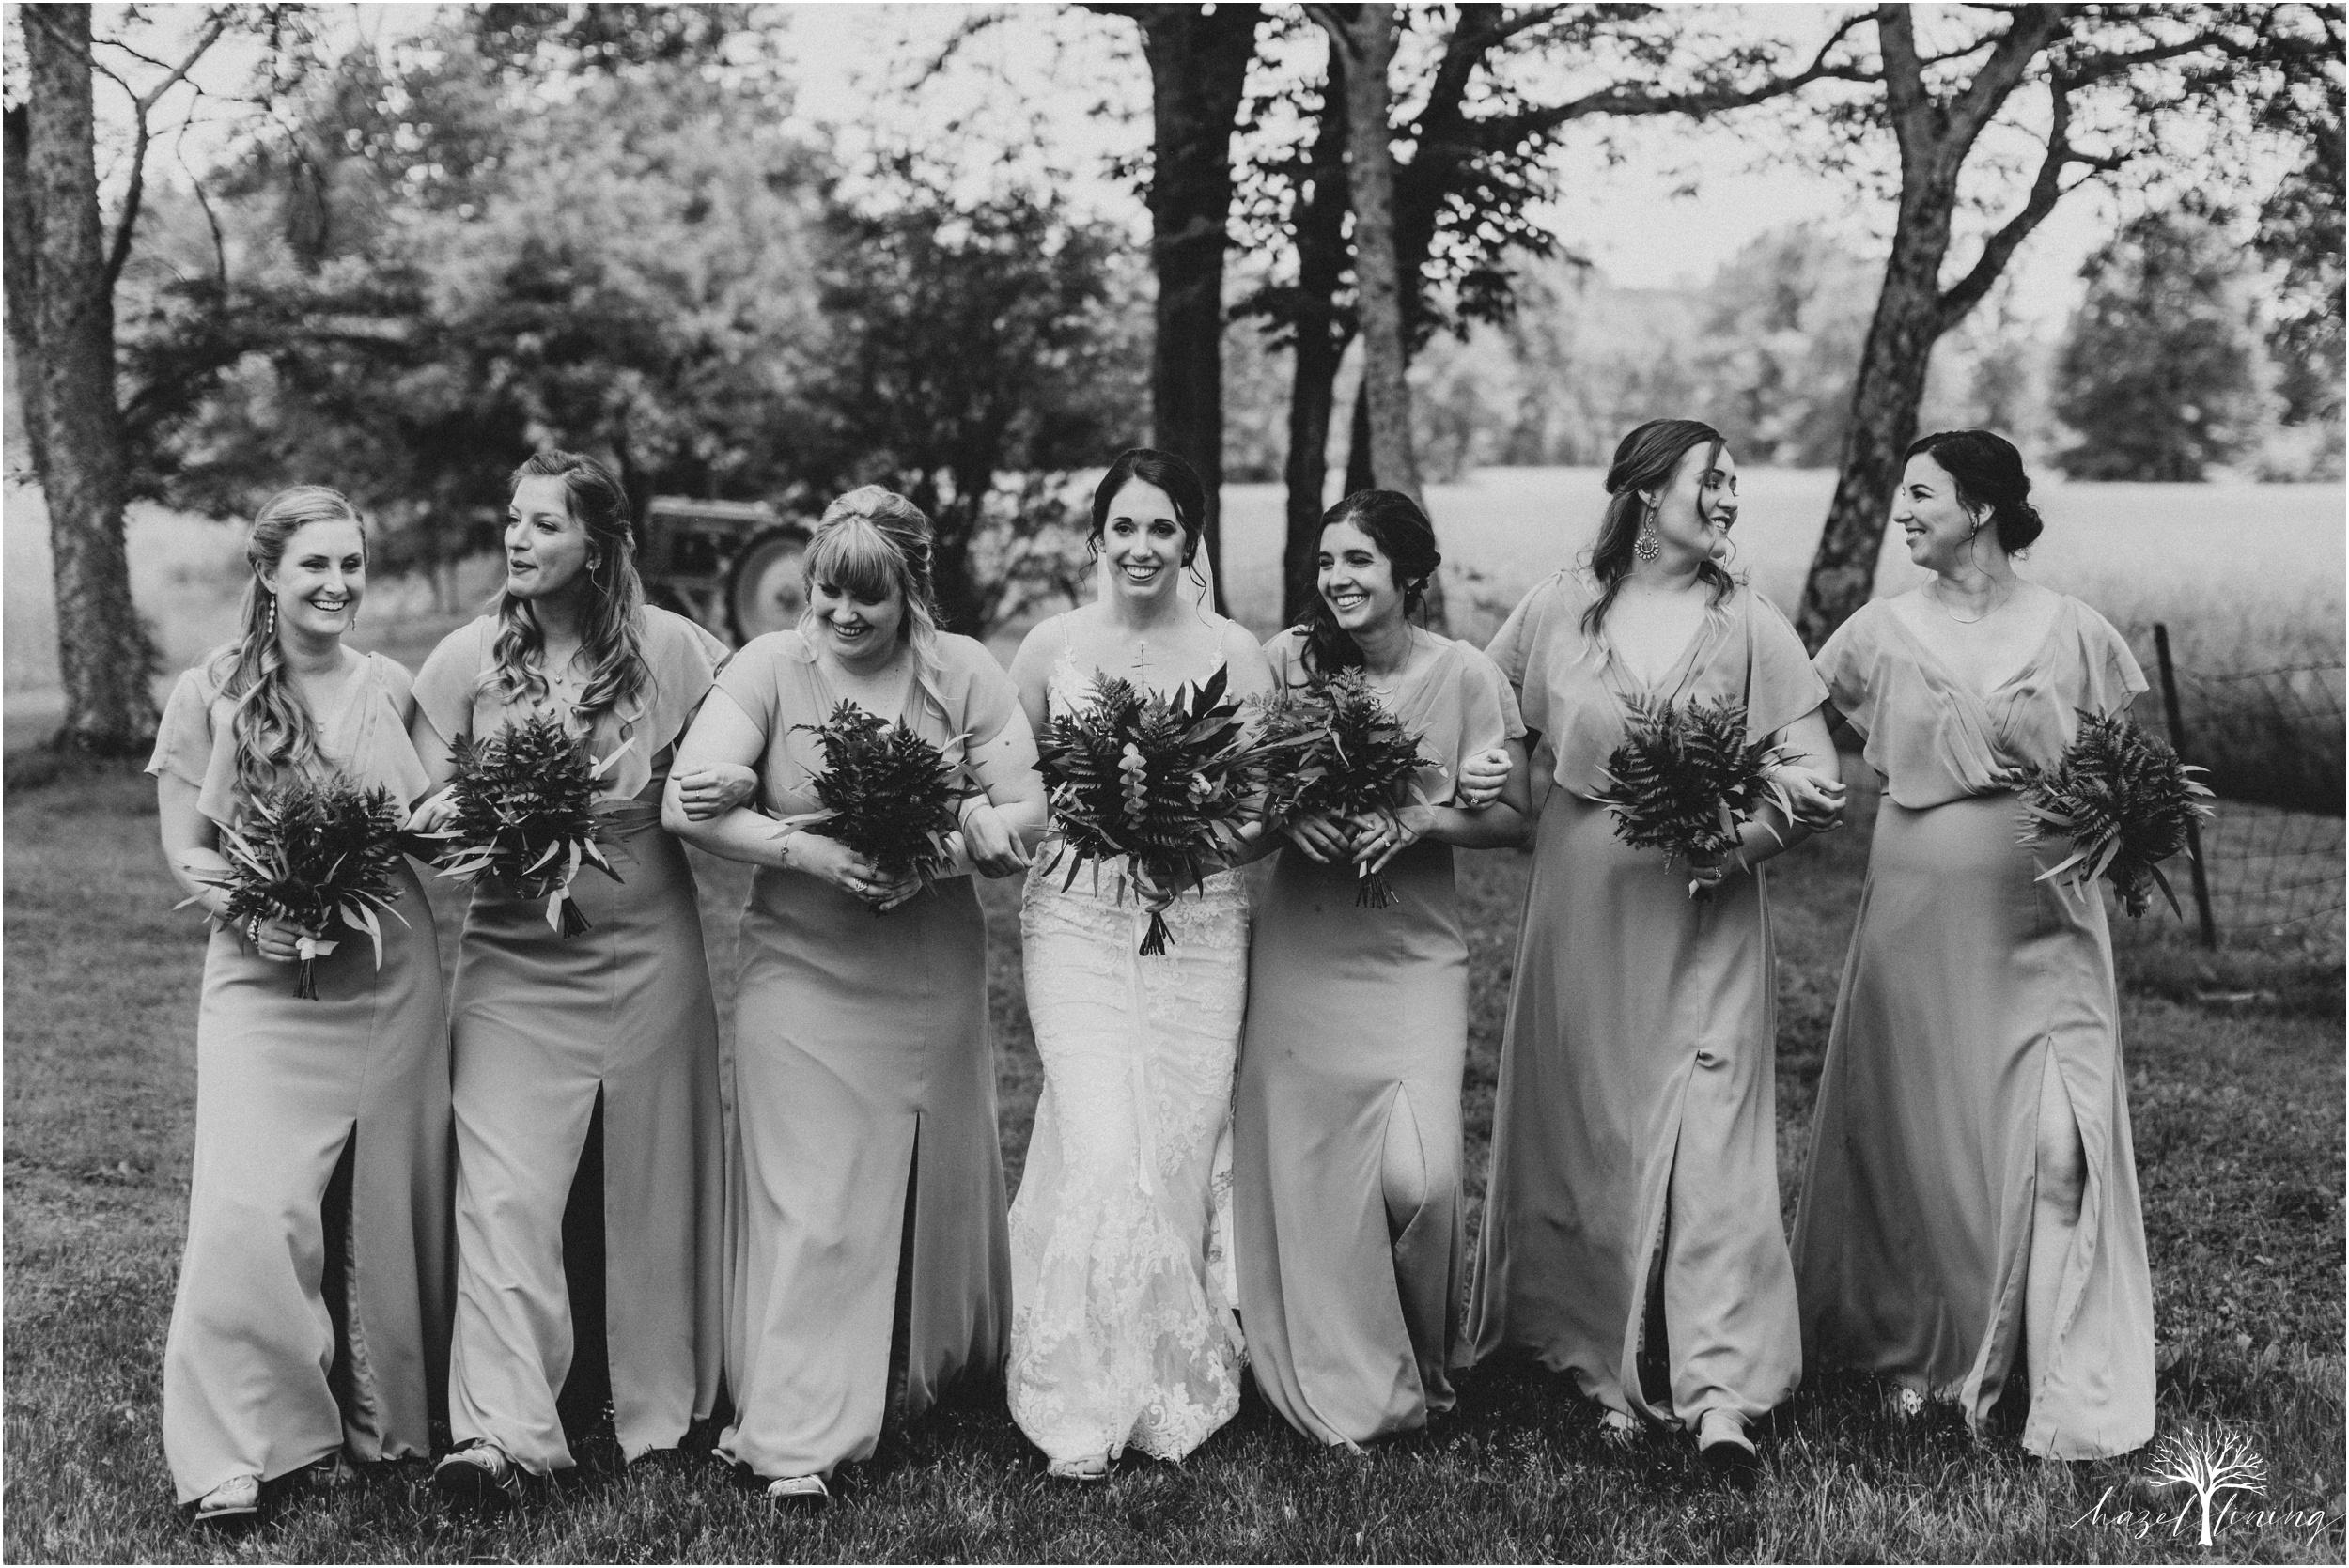 hazel-lining-travel-wedding-elopement-photography-lisa-landon-shoemaker-the-farm-bakery-and-events-bucks-county-quakertown-pennsylvania-summer-country-outdoor-farm-wedding_0033.jpg